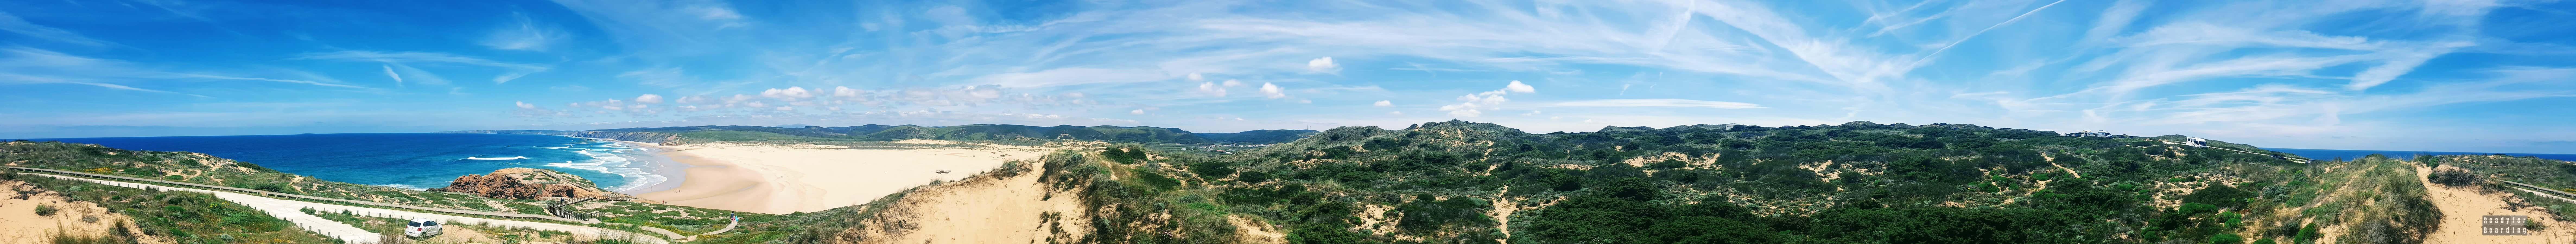 Panorama: Praia Da Bordeira, Algarve, Portugalia